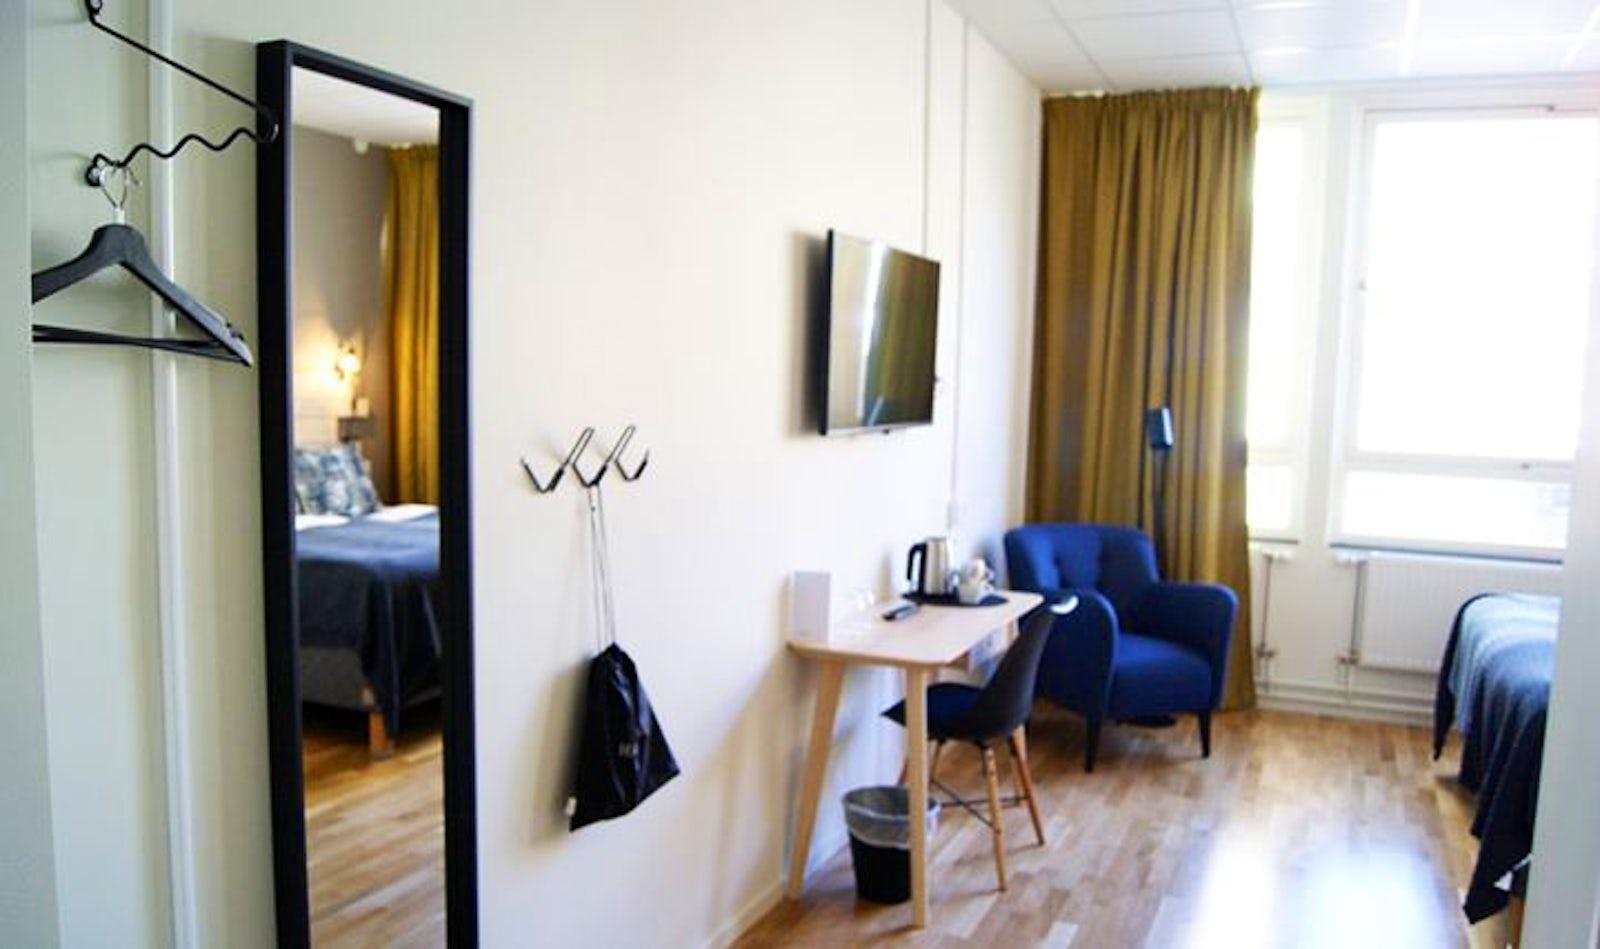 Travel inspired - Location - Hotel Falun   itinari